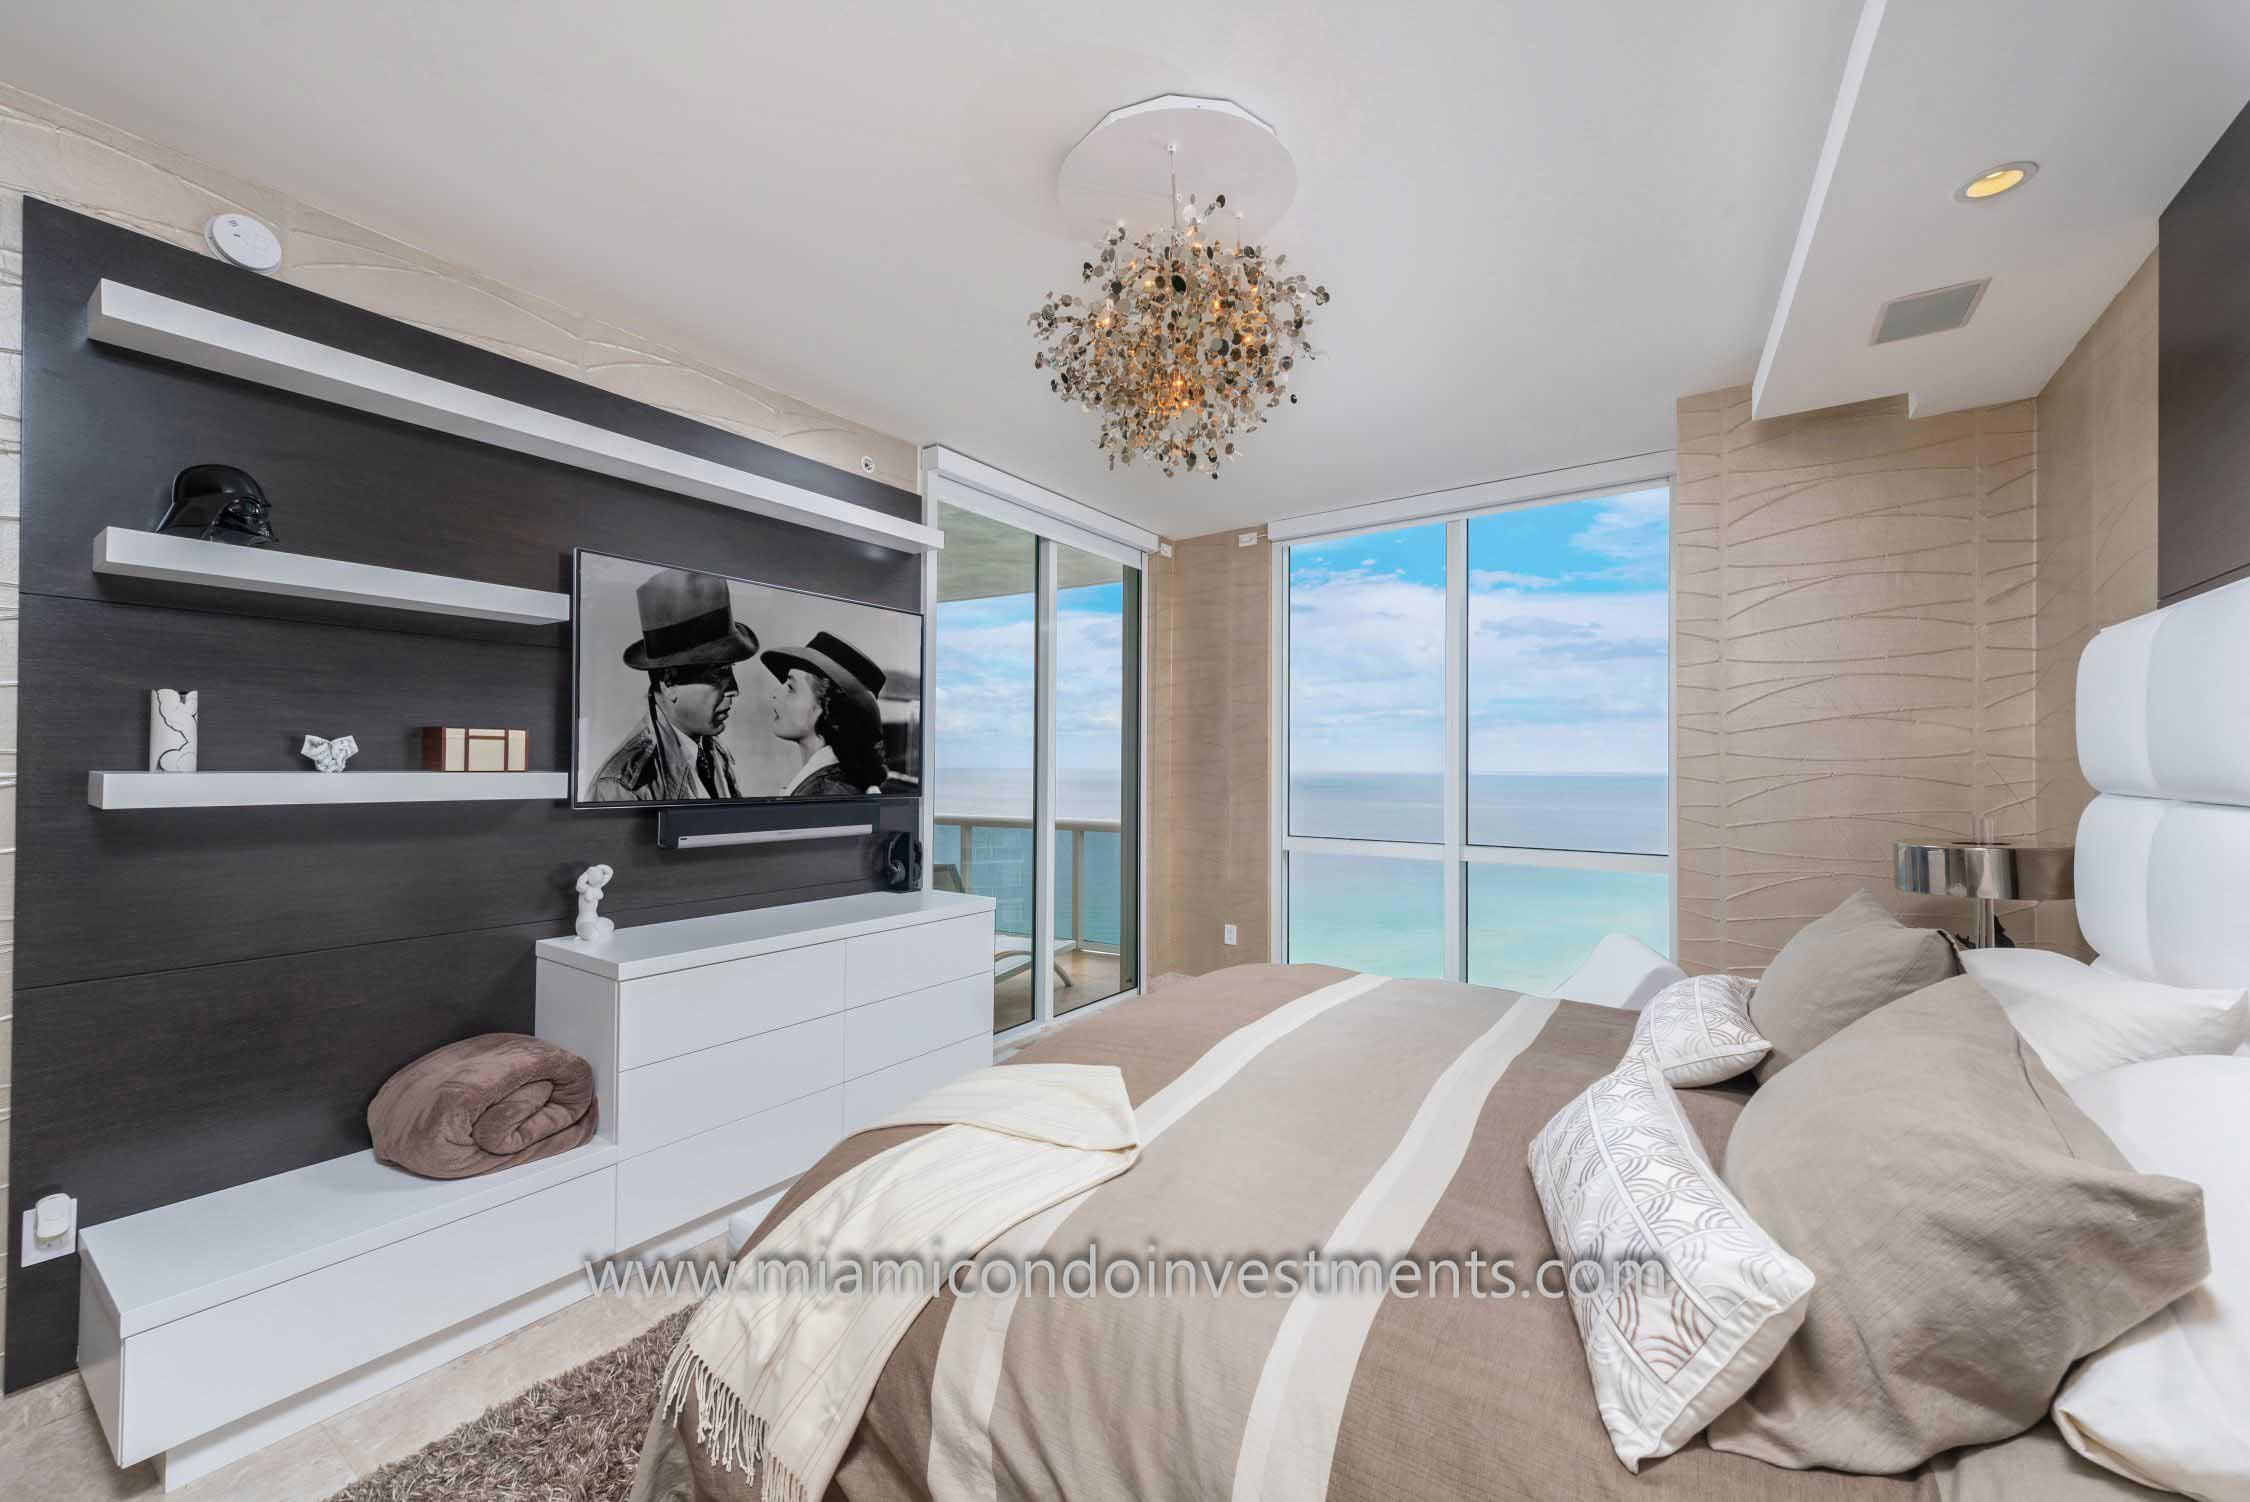 trump-palace-unit-3604-sunny-isles-beach-17